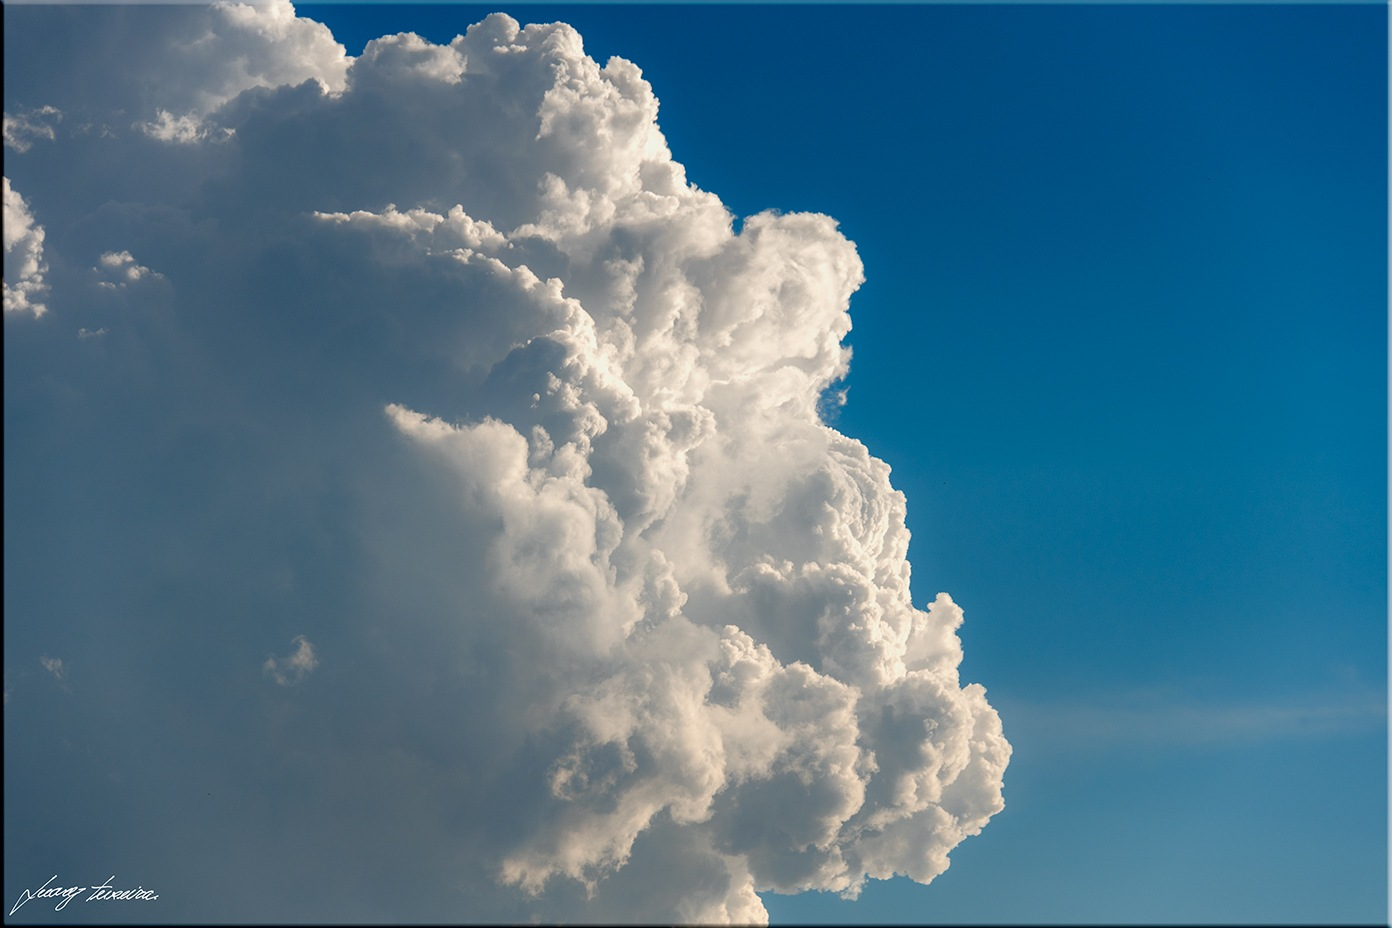 Cotton cloud by Juarez Teixeira